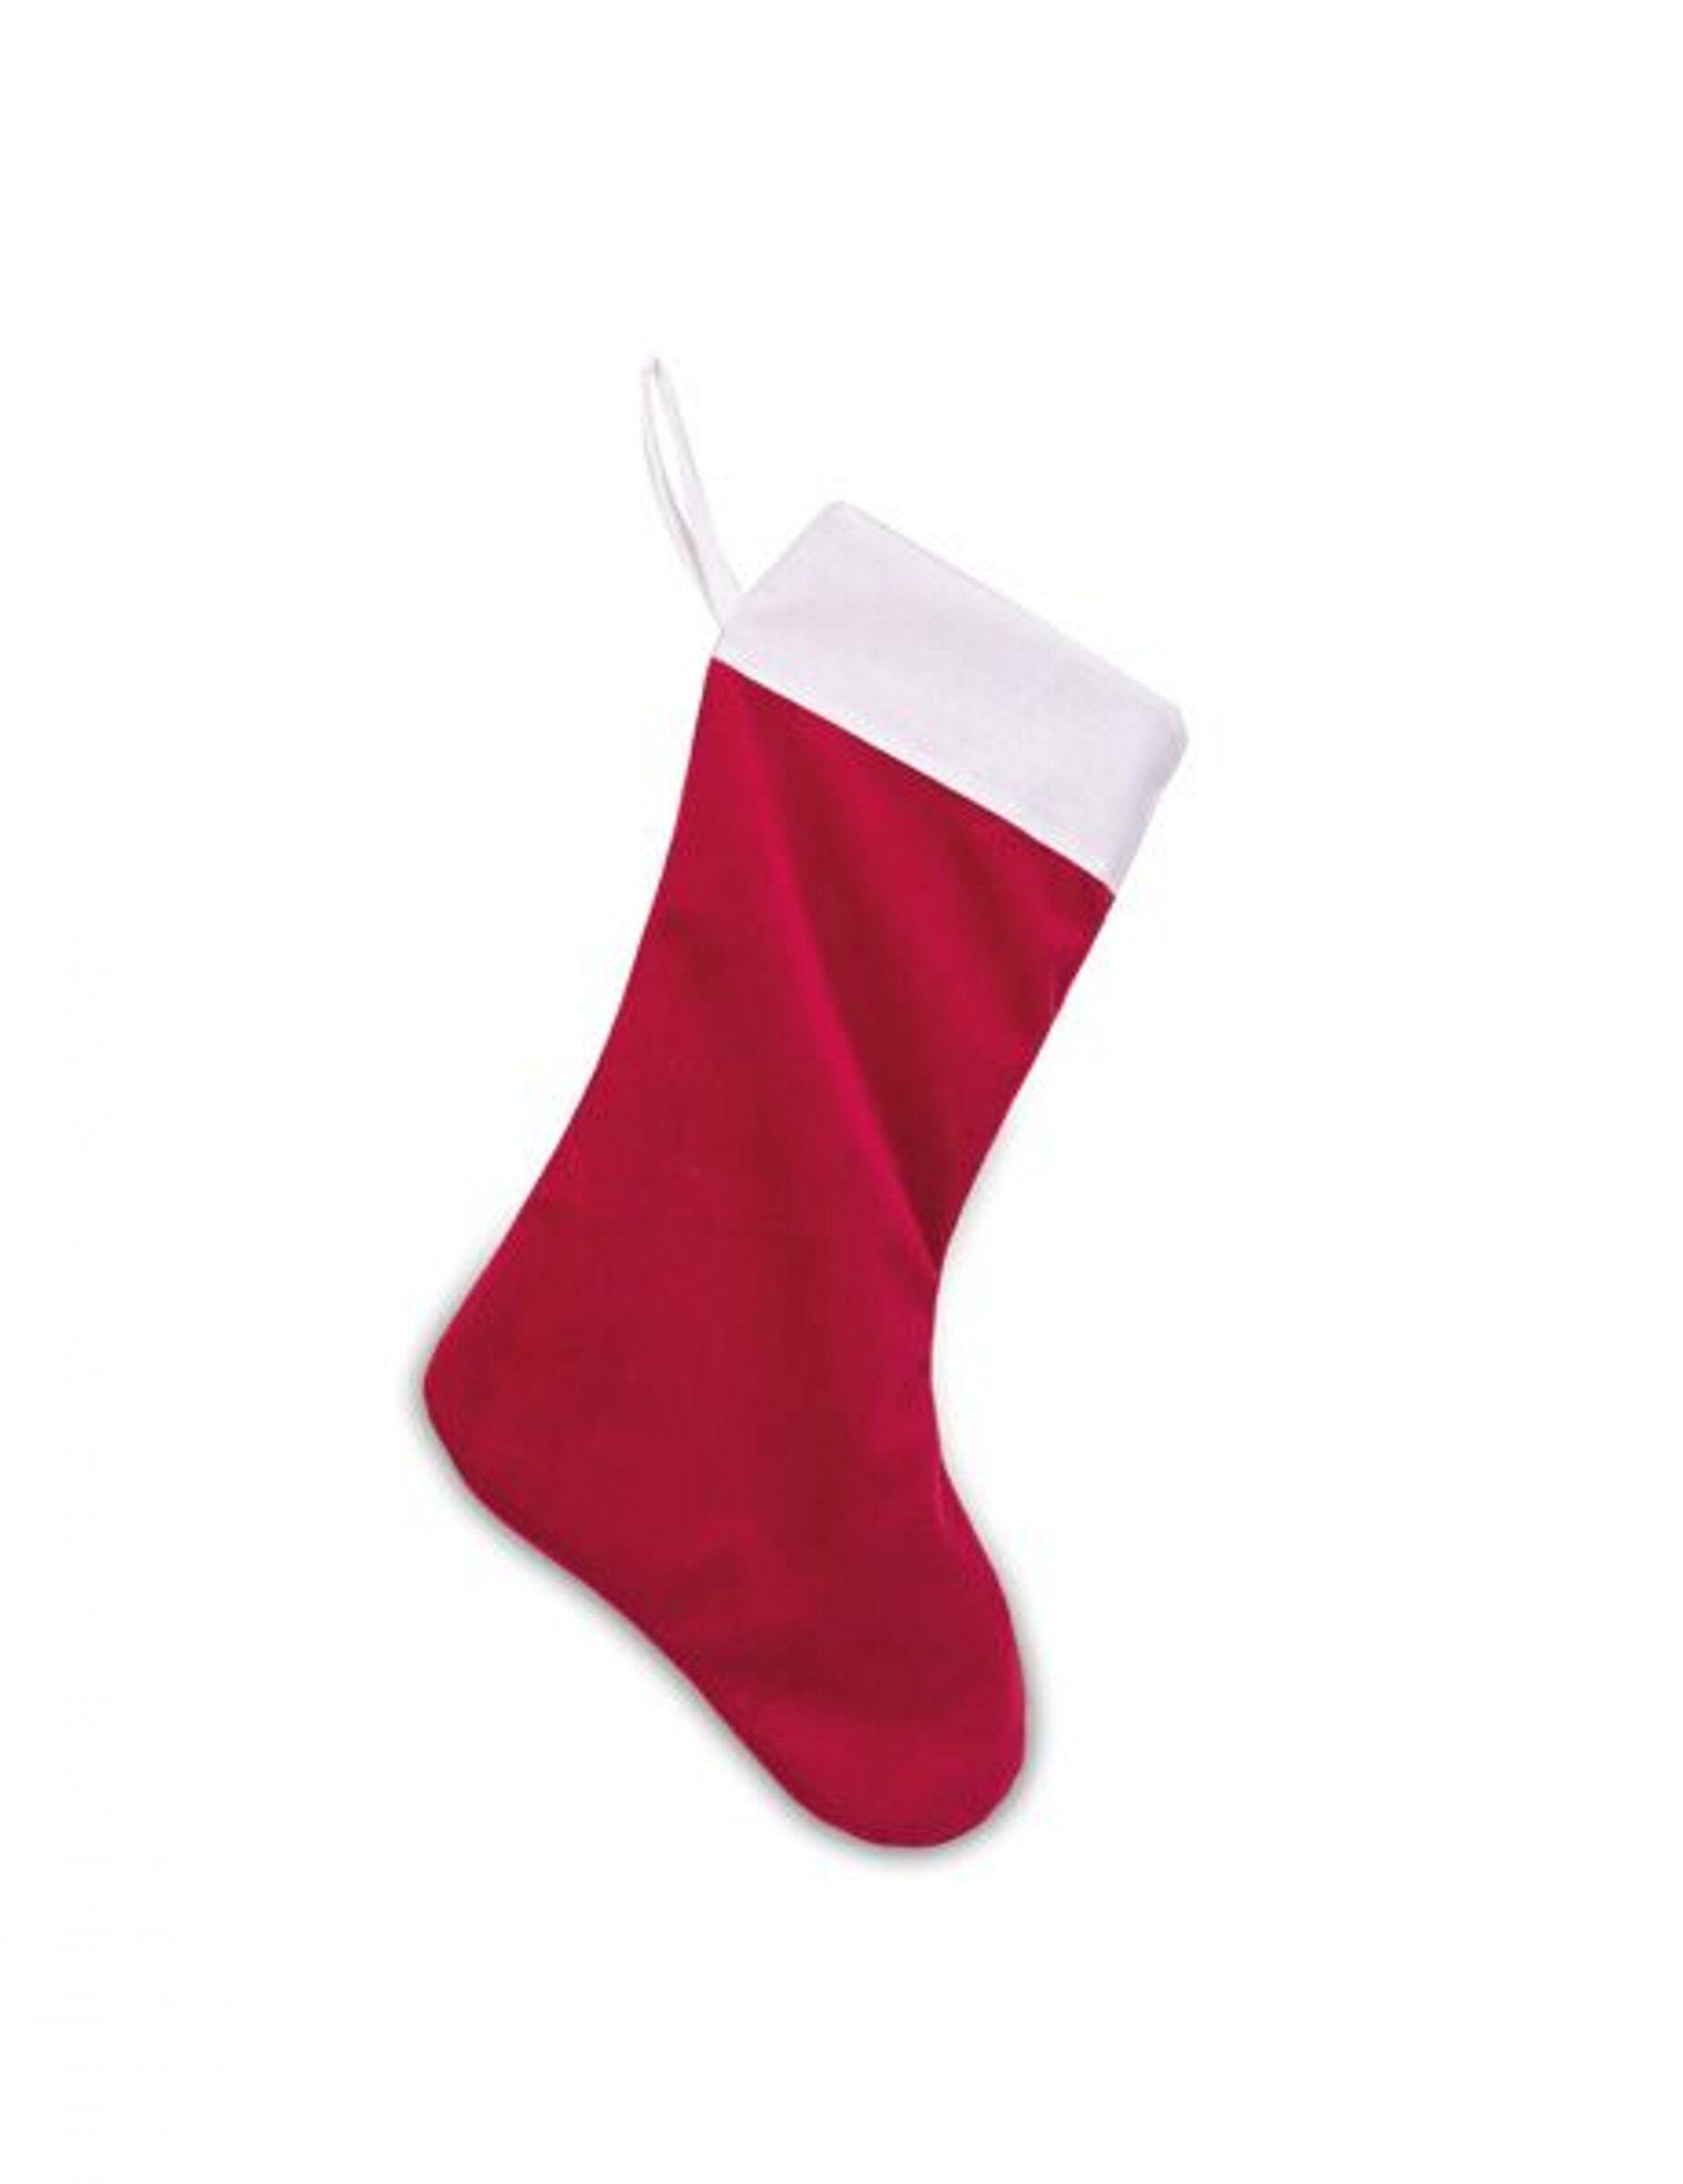 Vegaoo.es Bota Papá Noel terciopelo rojo y algodón blanco 29 x 48 cm